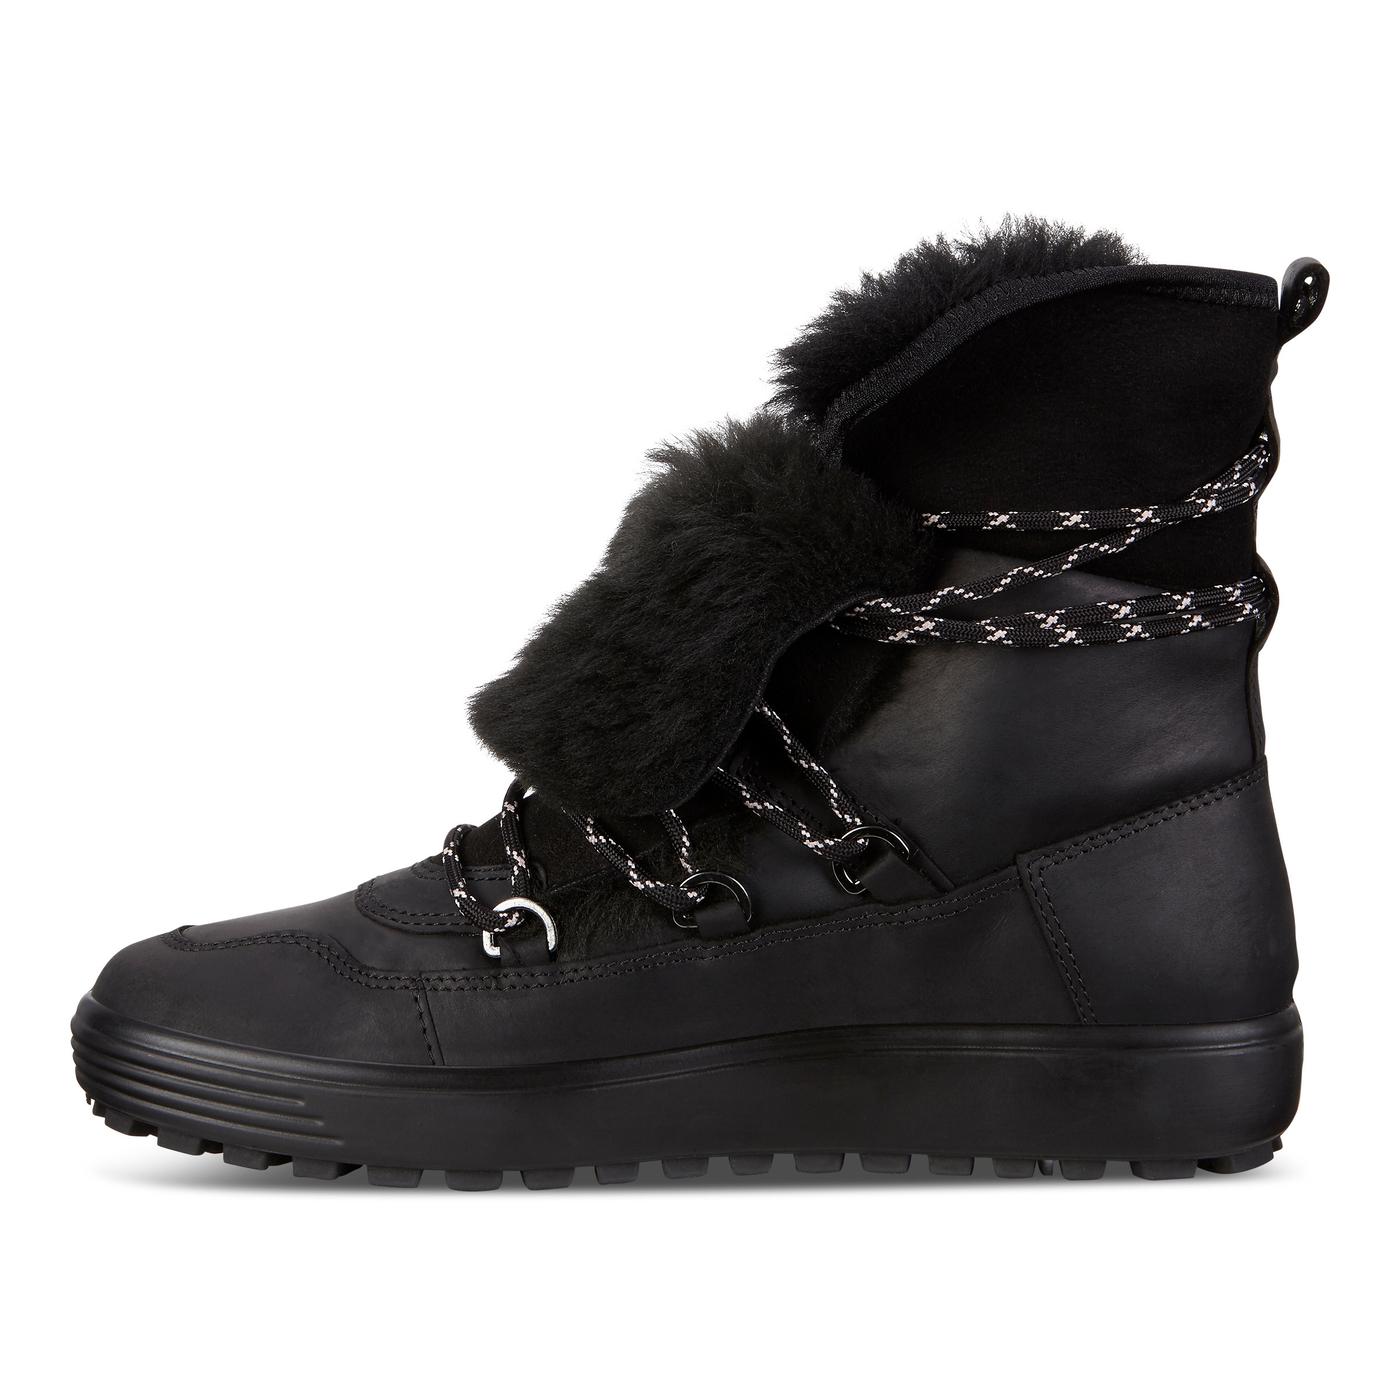 8268a70ebf ECCO Womens Soft 7 TRED Mid | Women's Shoes | ECCO® Shoes